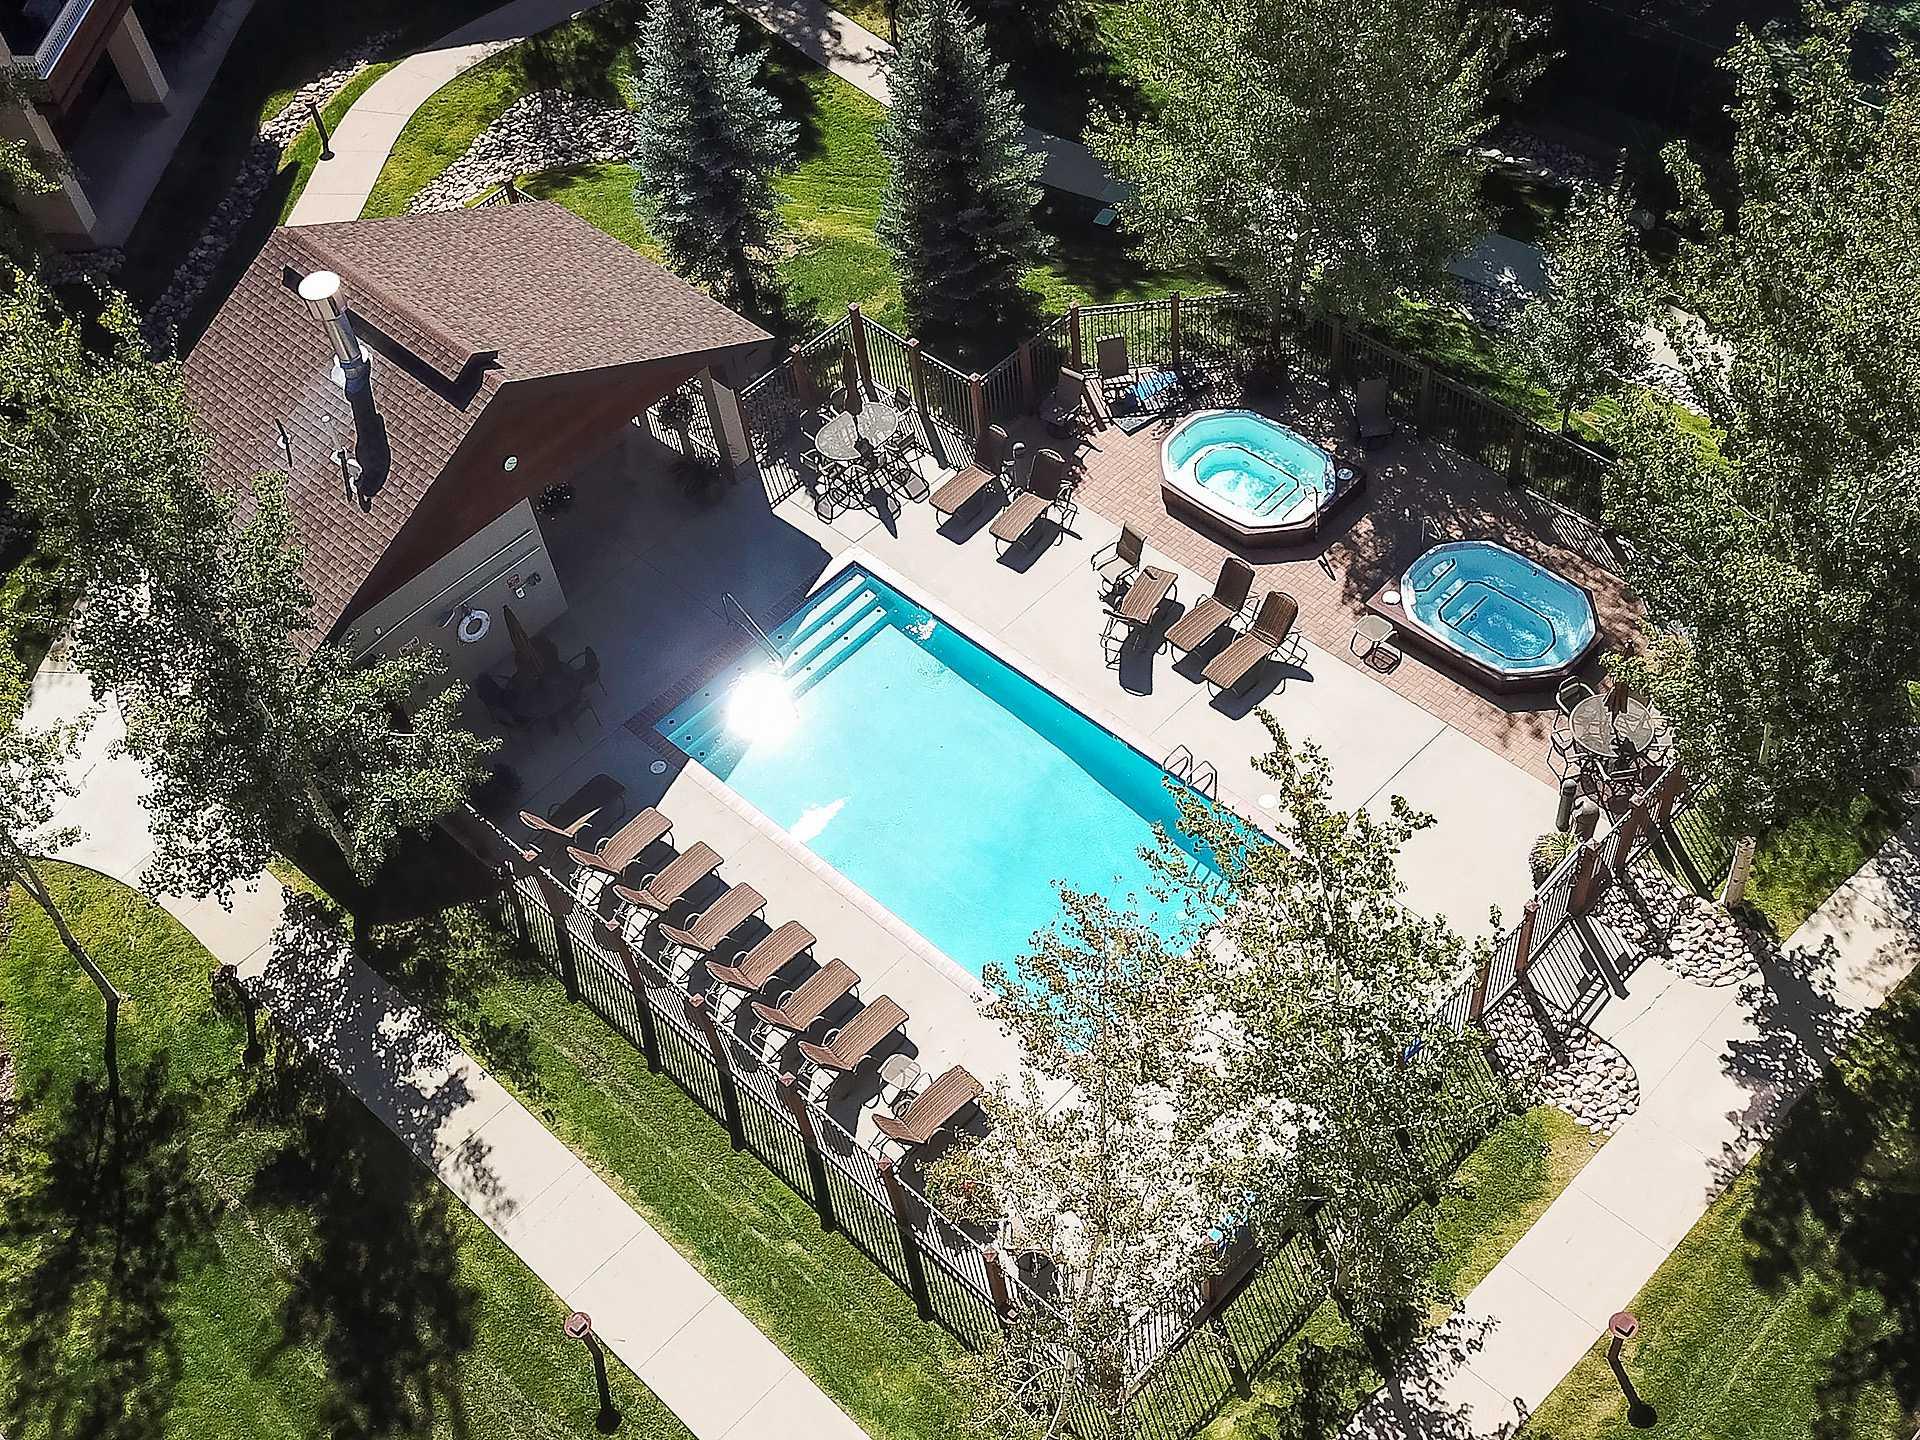 AL4205: Aspen Lodge